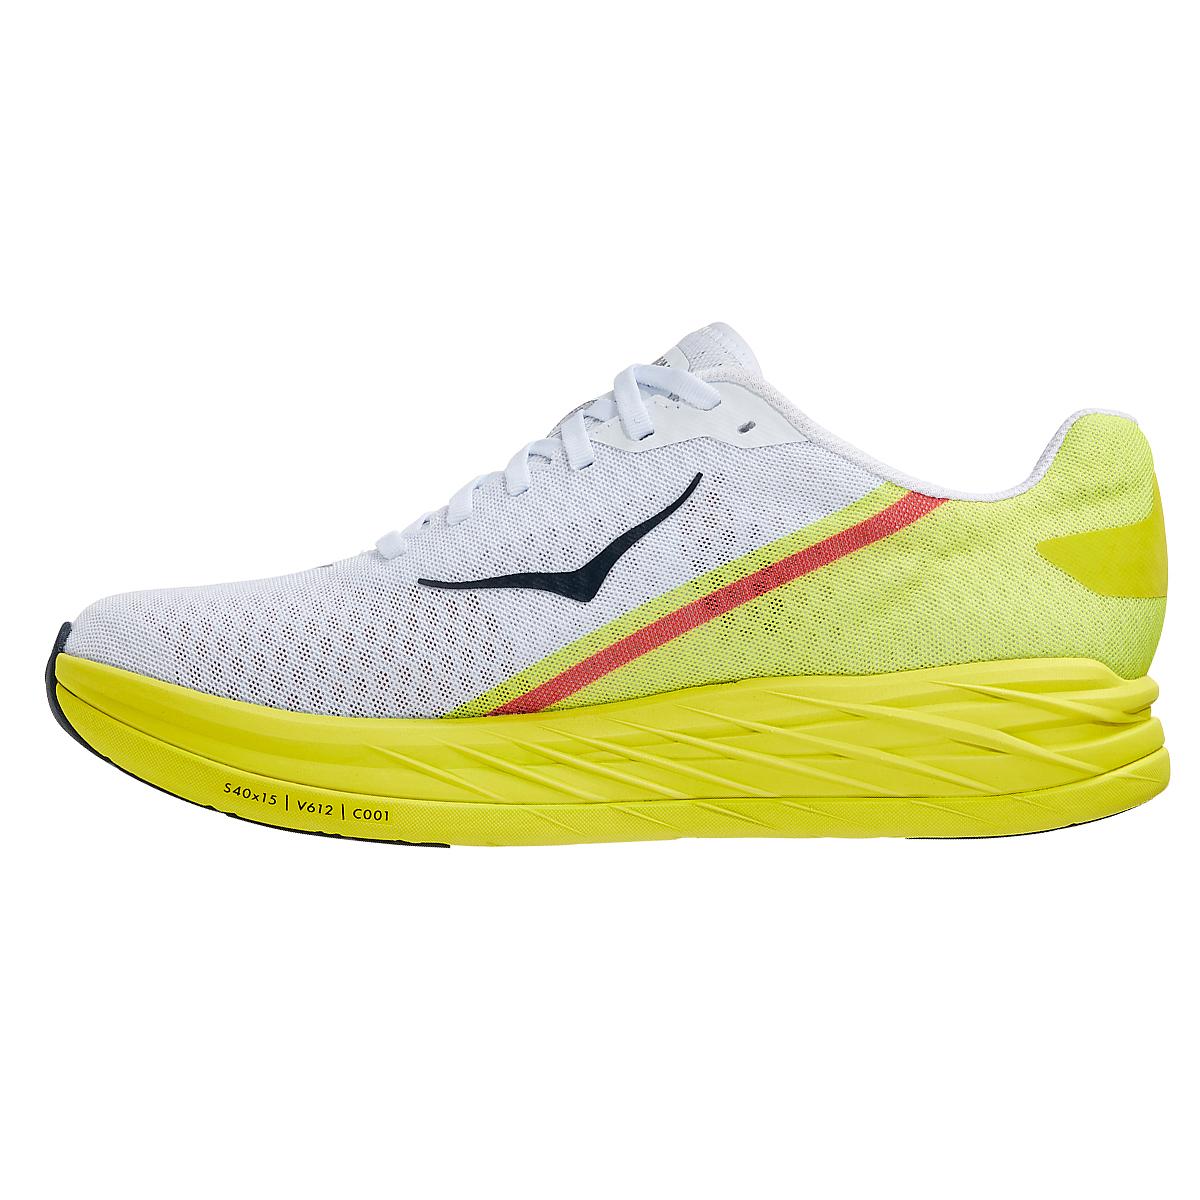 Men's Hoka One One Rocket X Running Shoe - Color: White/Evening Primrose - Size: 8.5 - Width: Regular, White/Evening Primrose, large, image 2